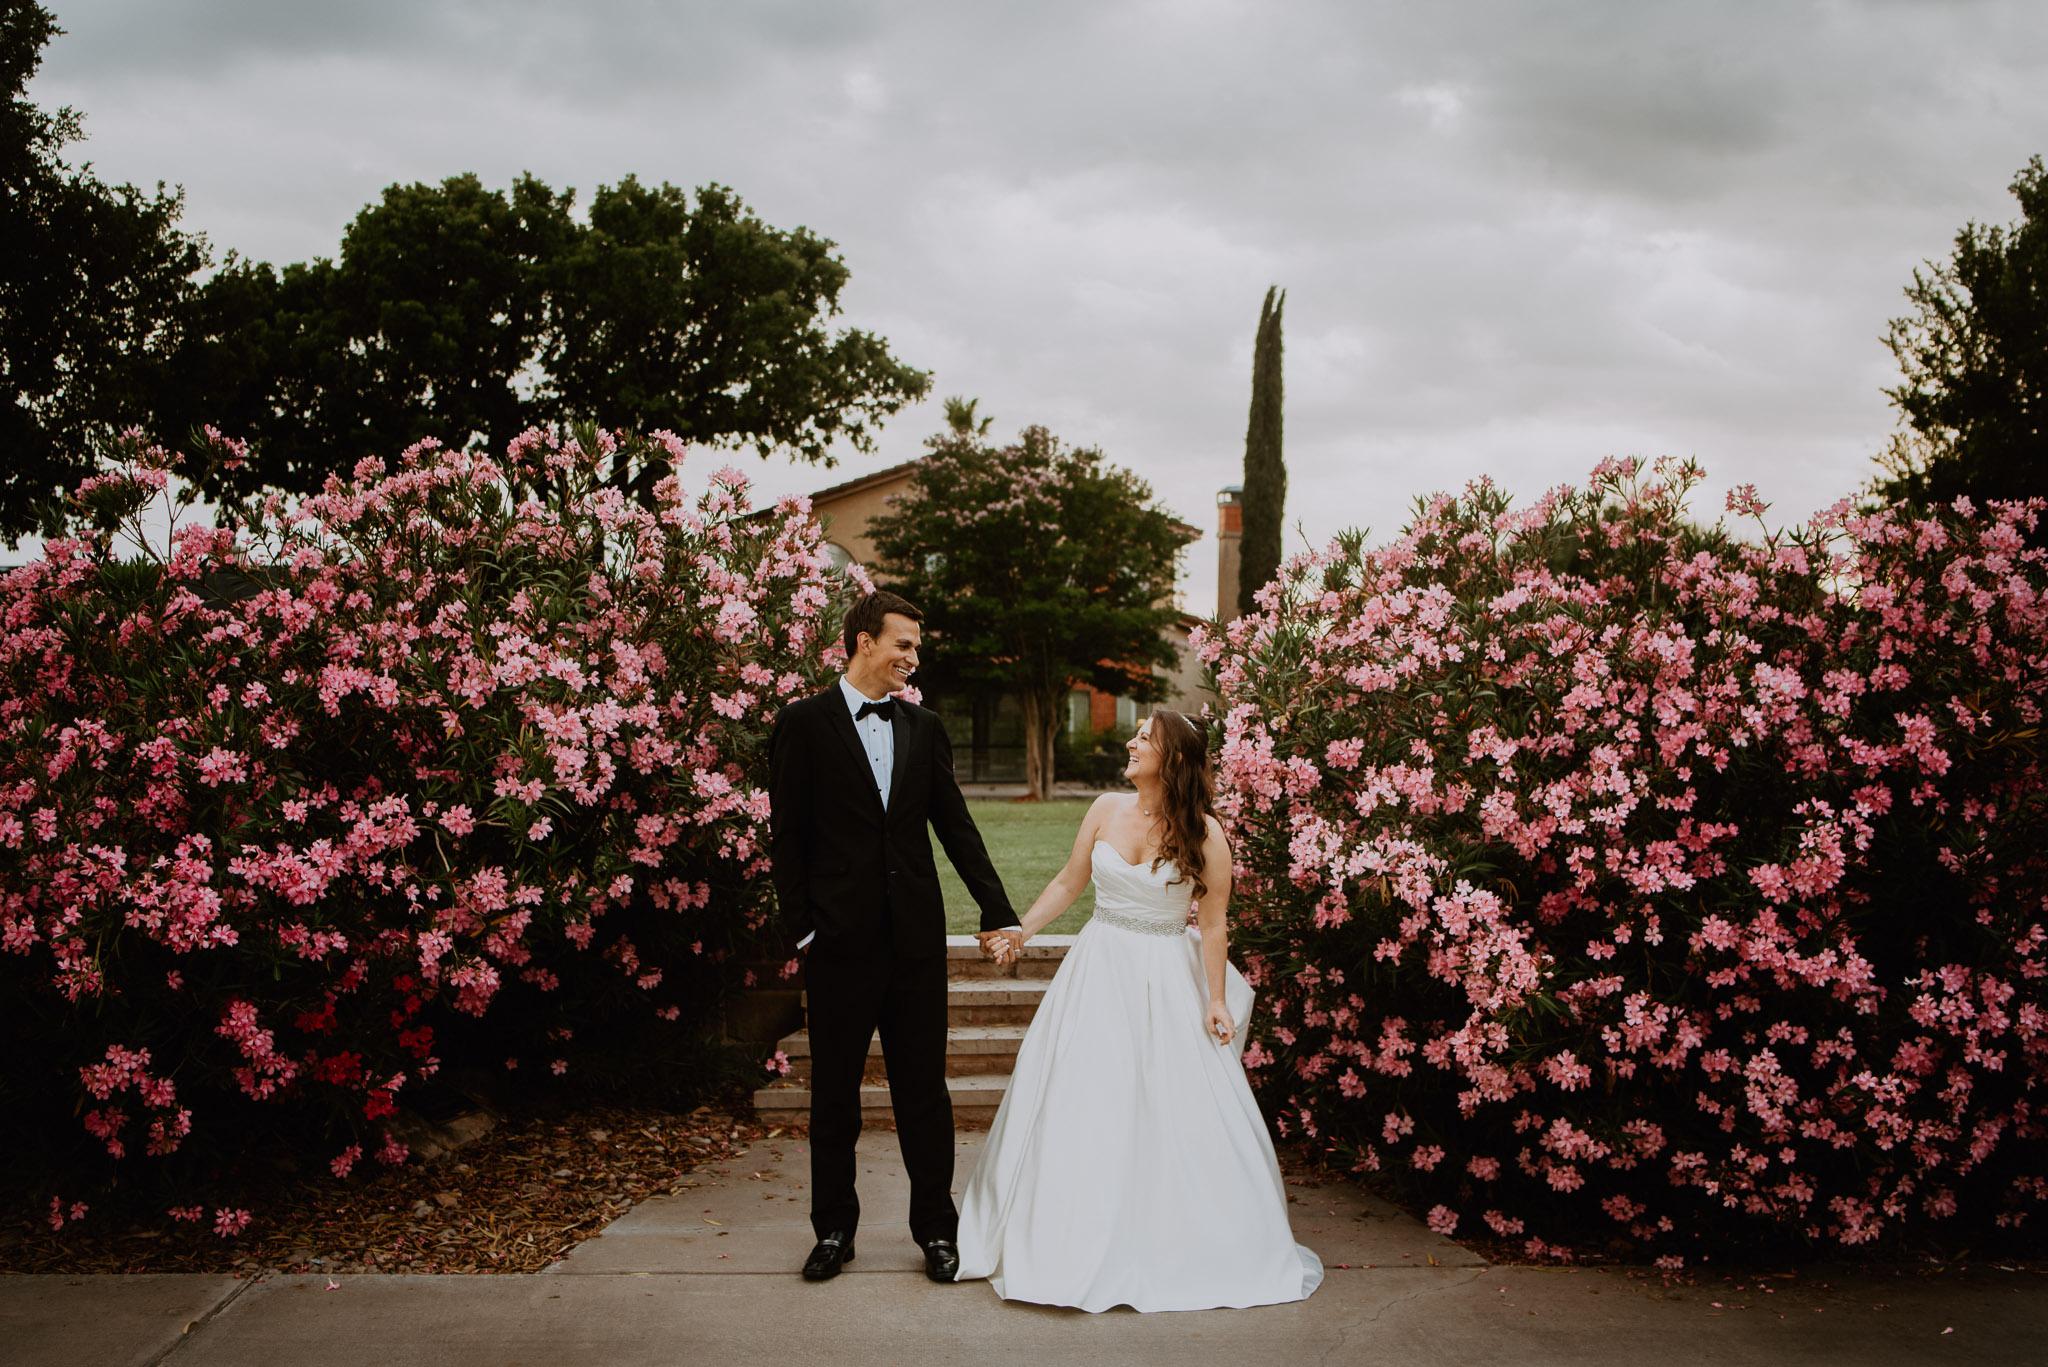 Bentwood-country-club-wedding-shea-tyson-0024.jpg